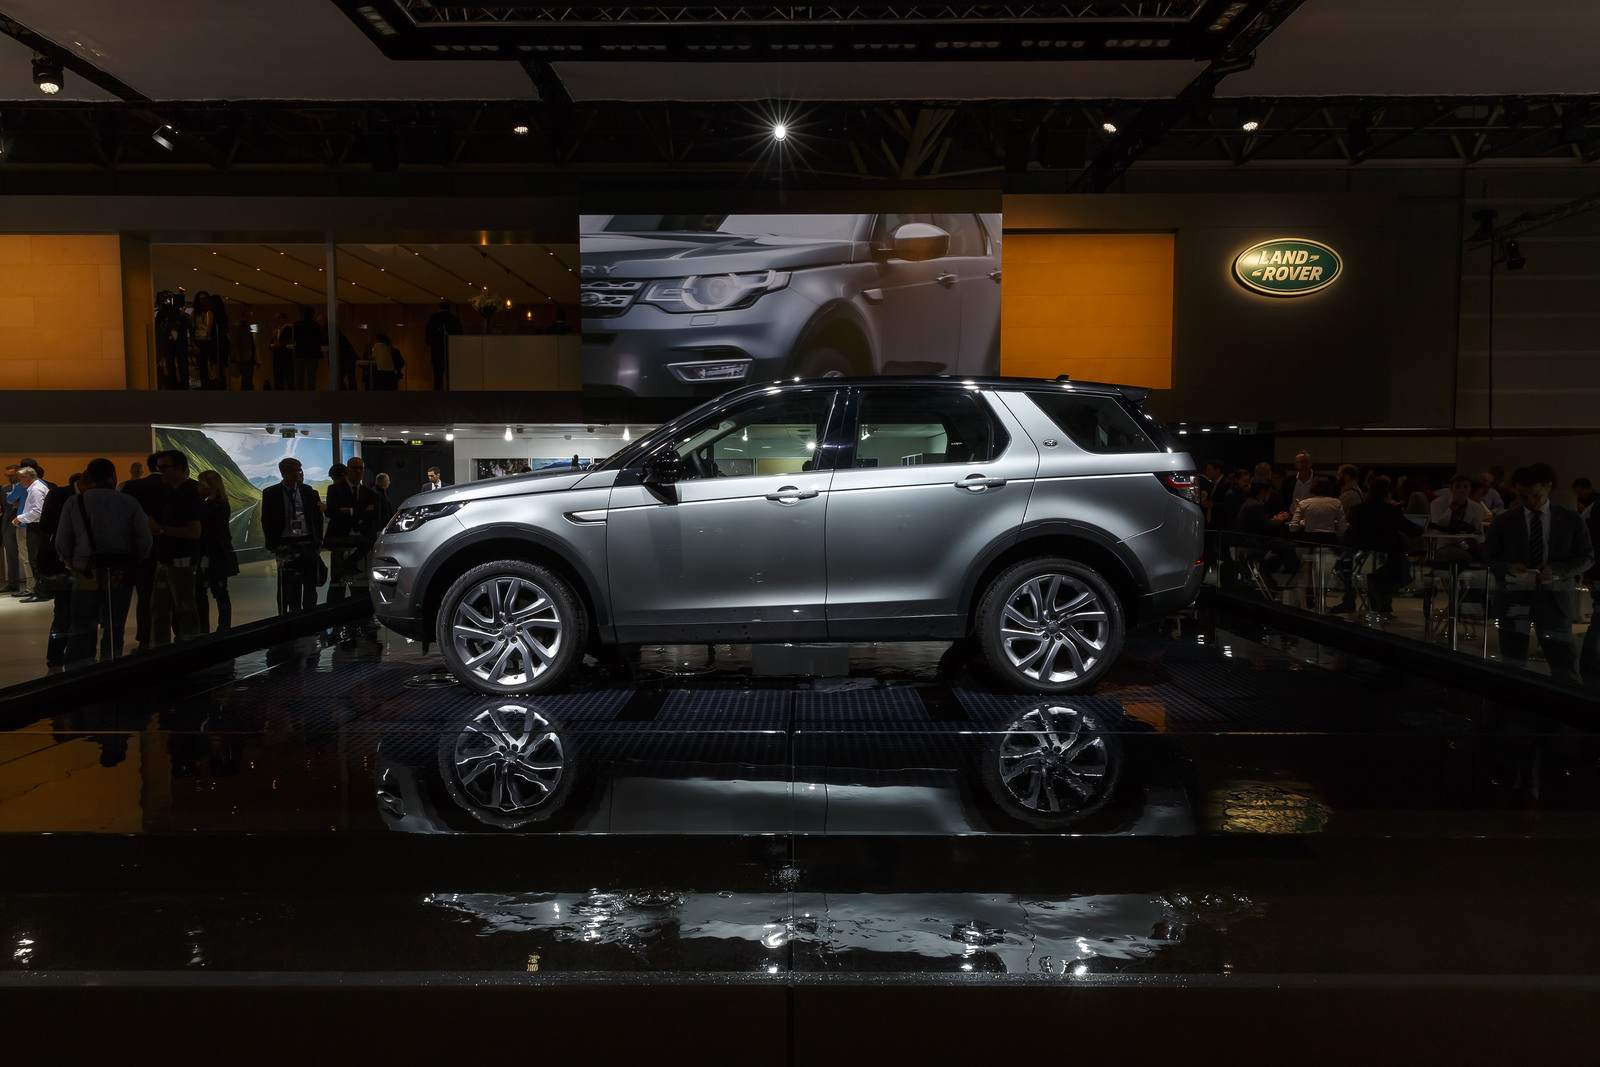 paris motor show1 Jaguar and Land Rover at Paris Auto Show 2014